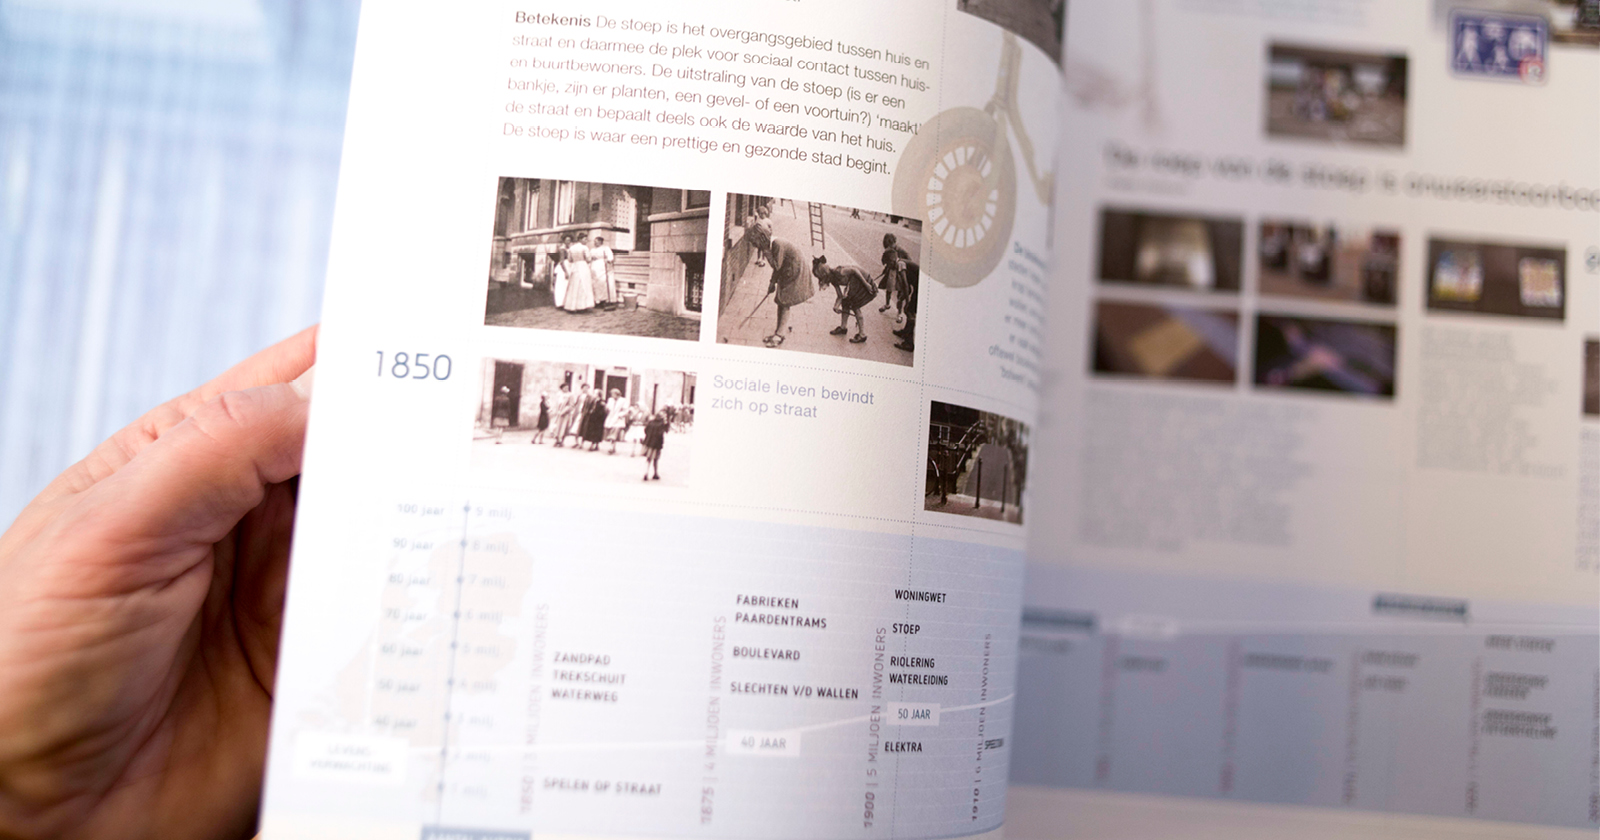 info-cartografics12-PubliekGeheim